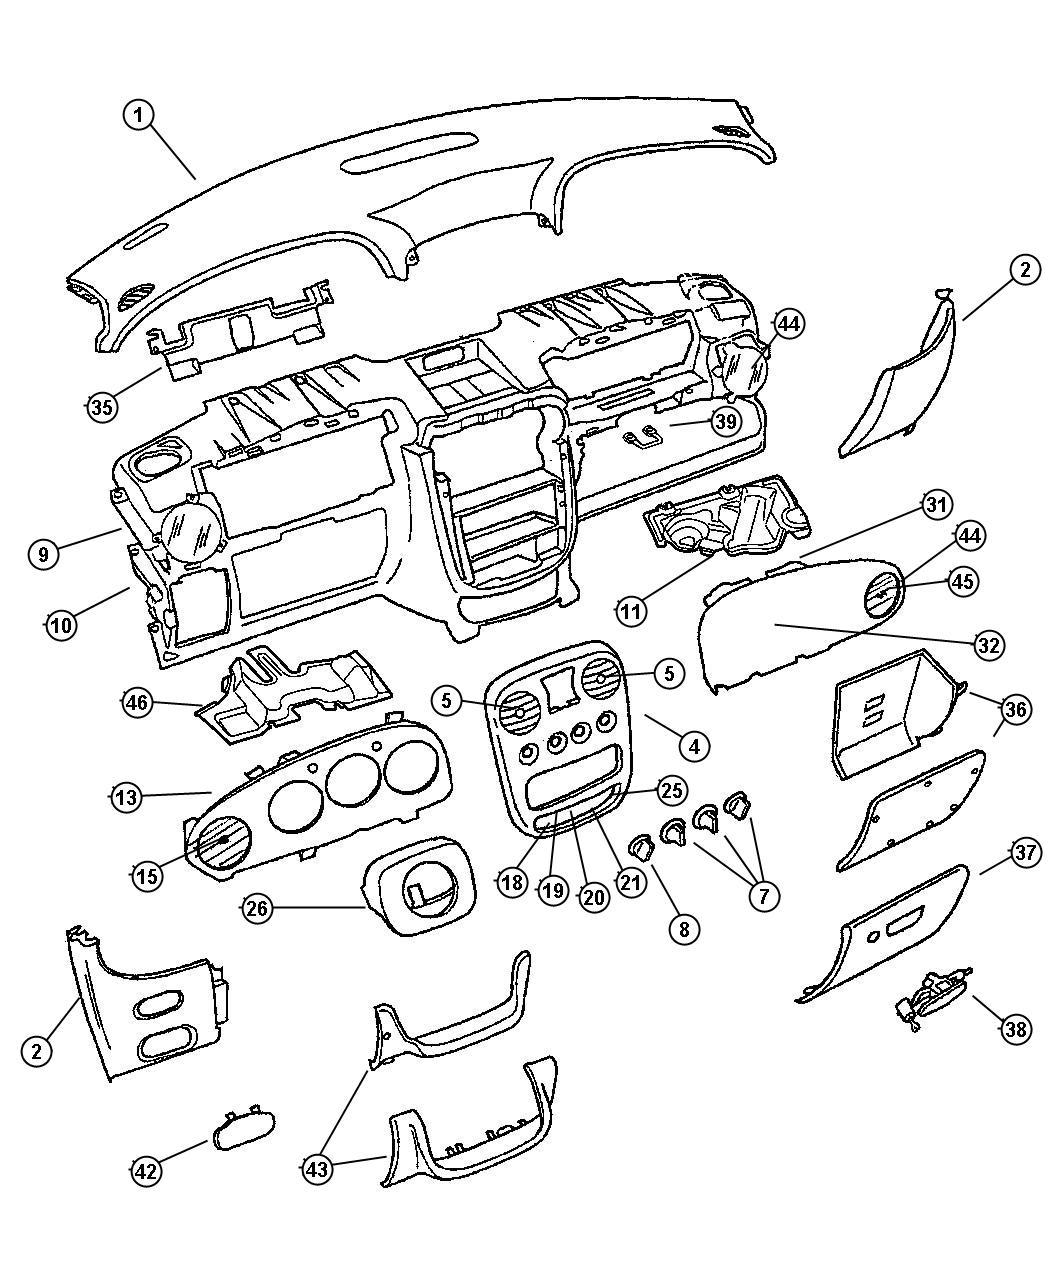 2003 Chrysler Pt Cruiser Switch. Export. Headlamp leveling